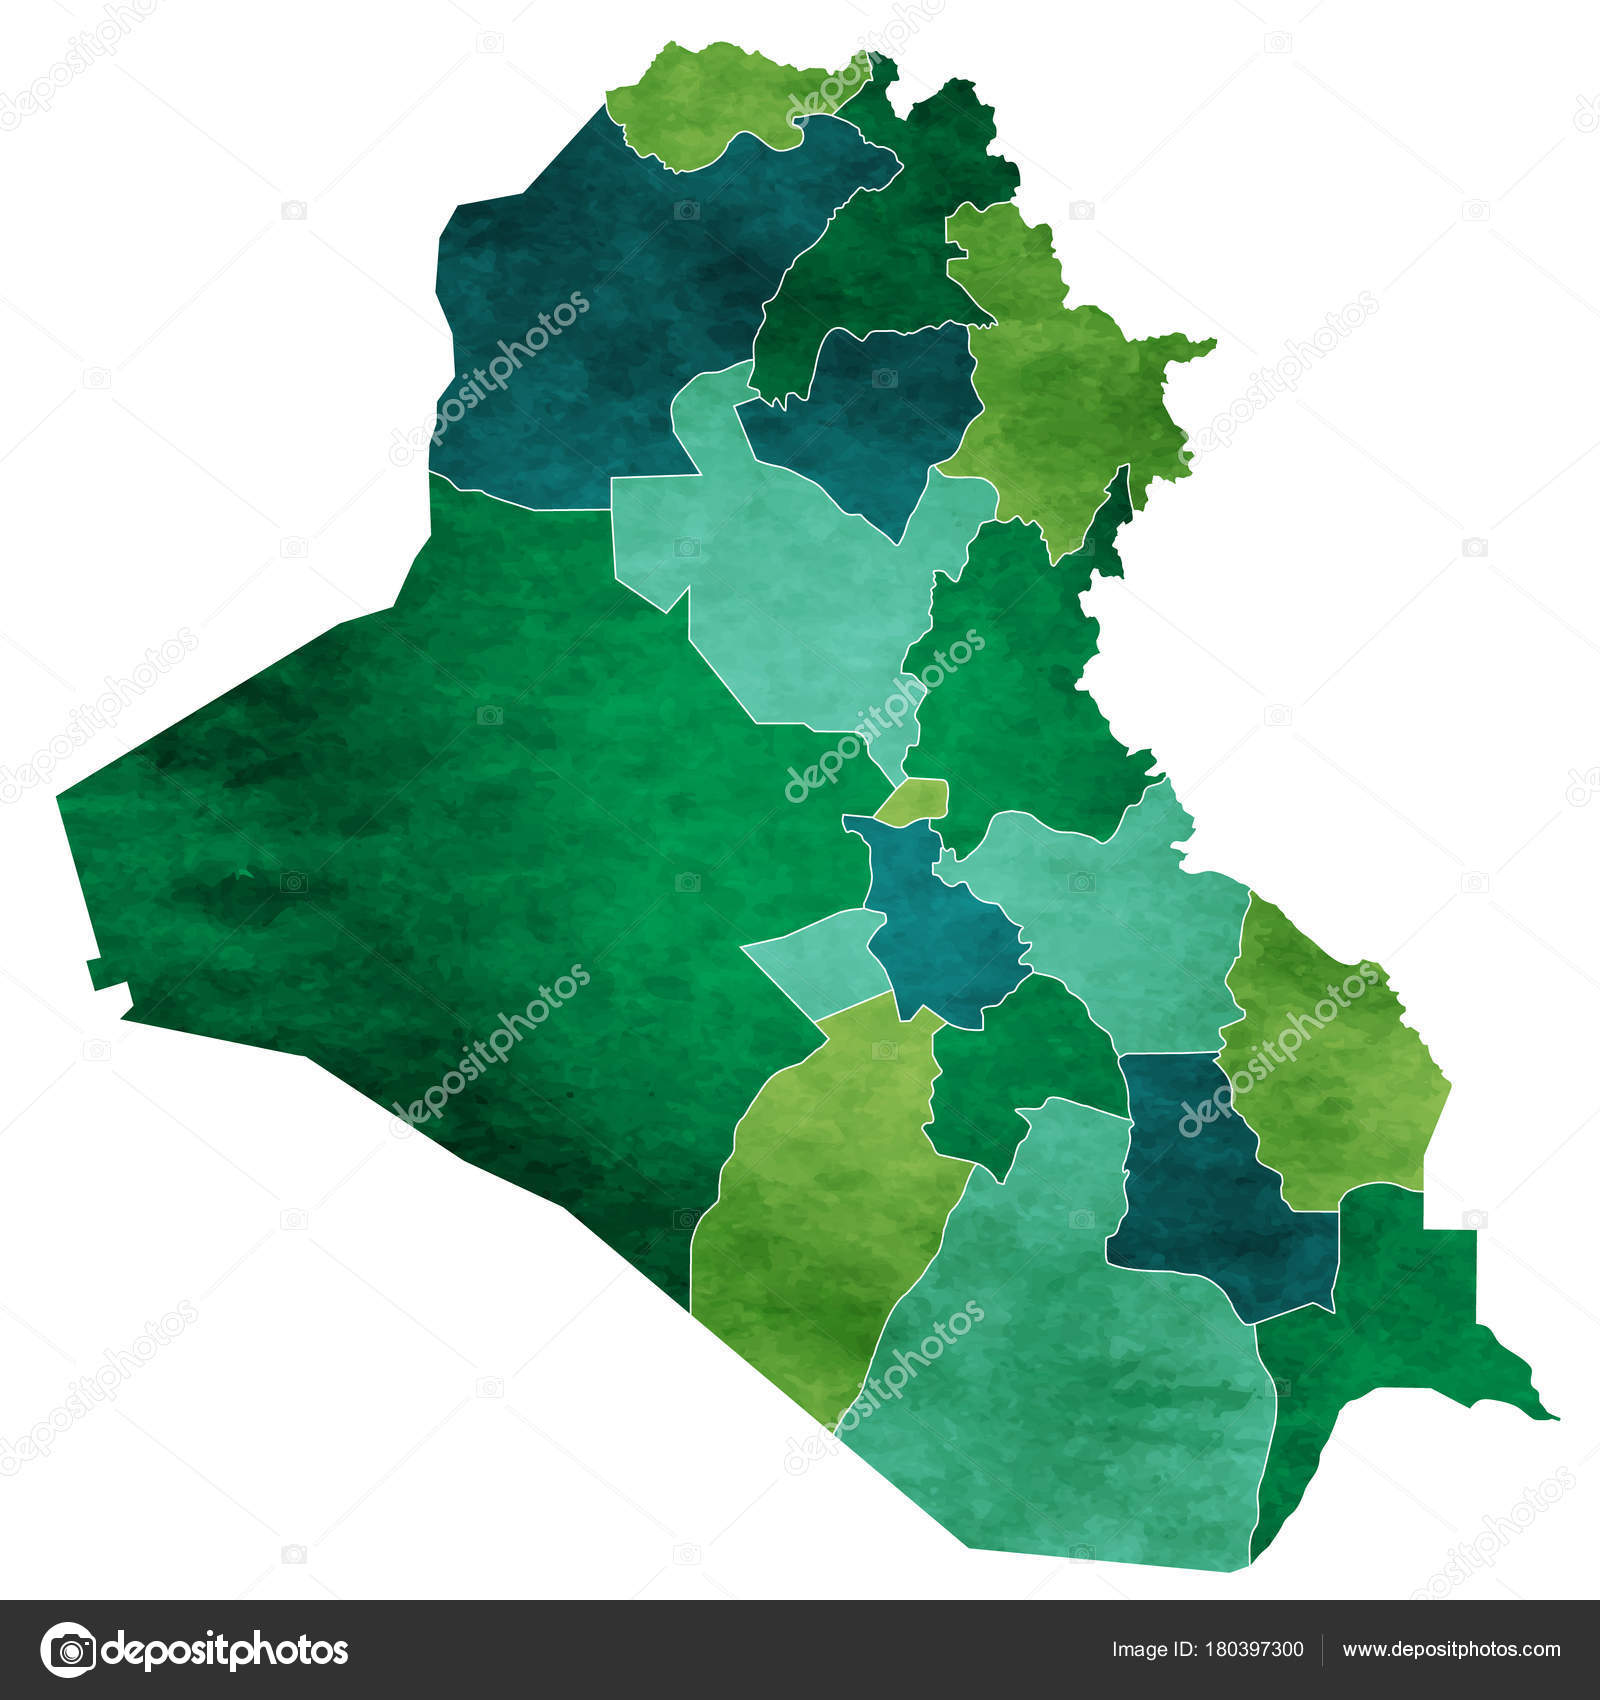 Icono pas mapa mundo iraq vector de stock jboy24 180397300 icono pas mapa mundo iraq vector de stock gumiabroncs Gallery